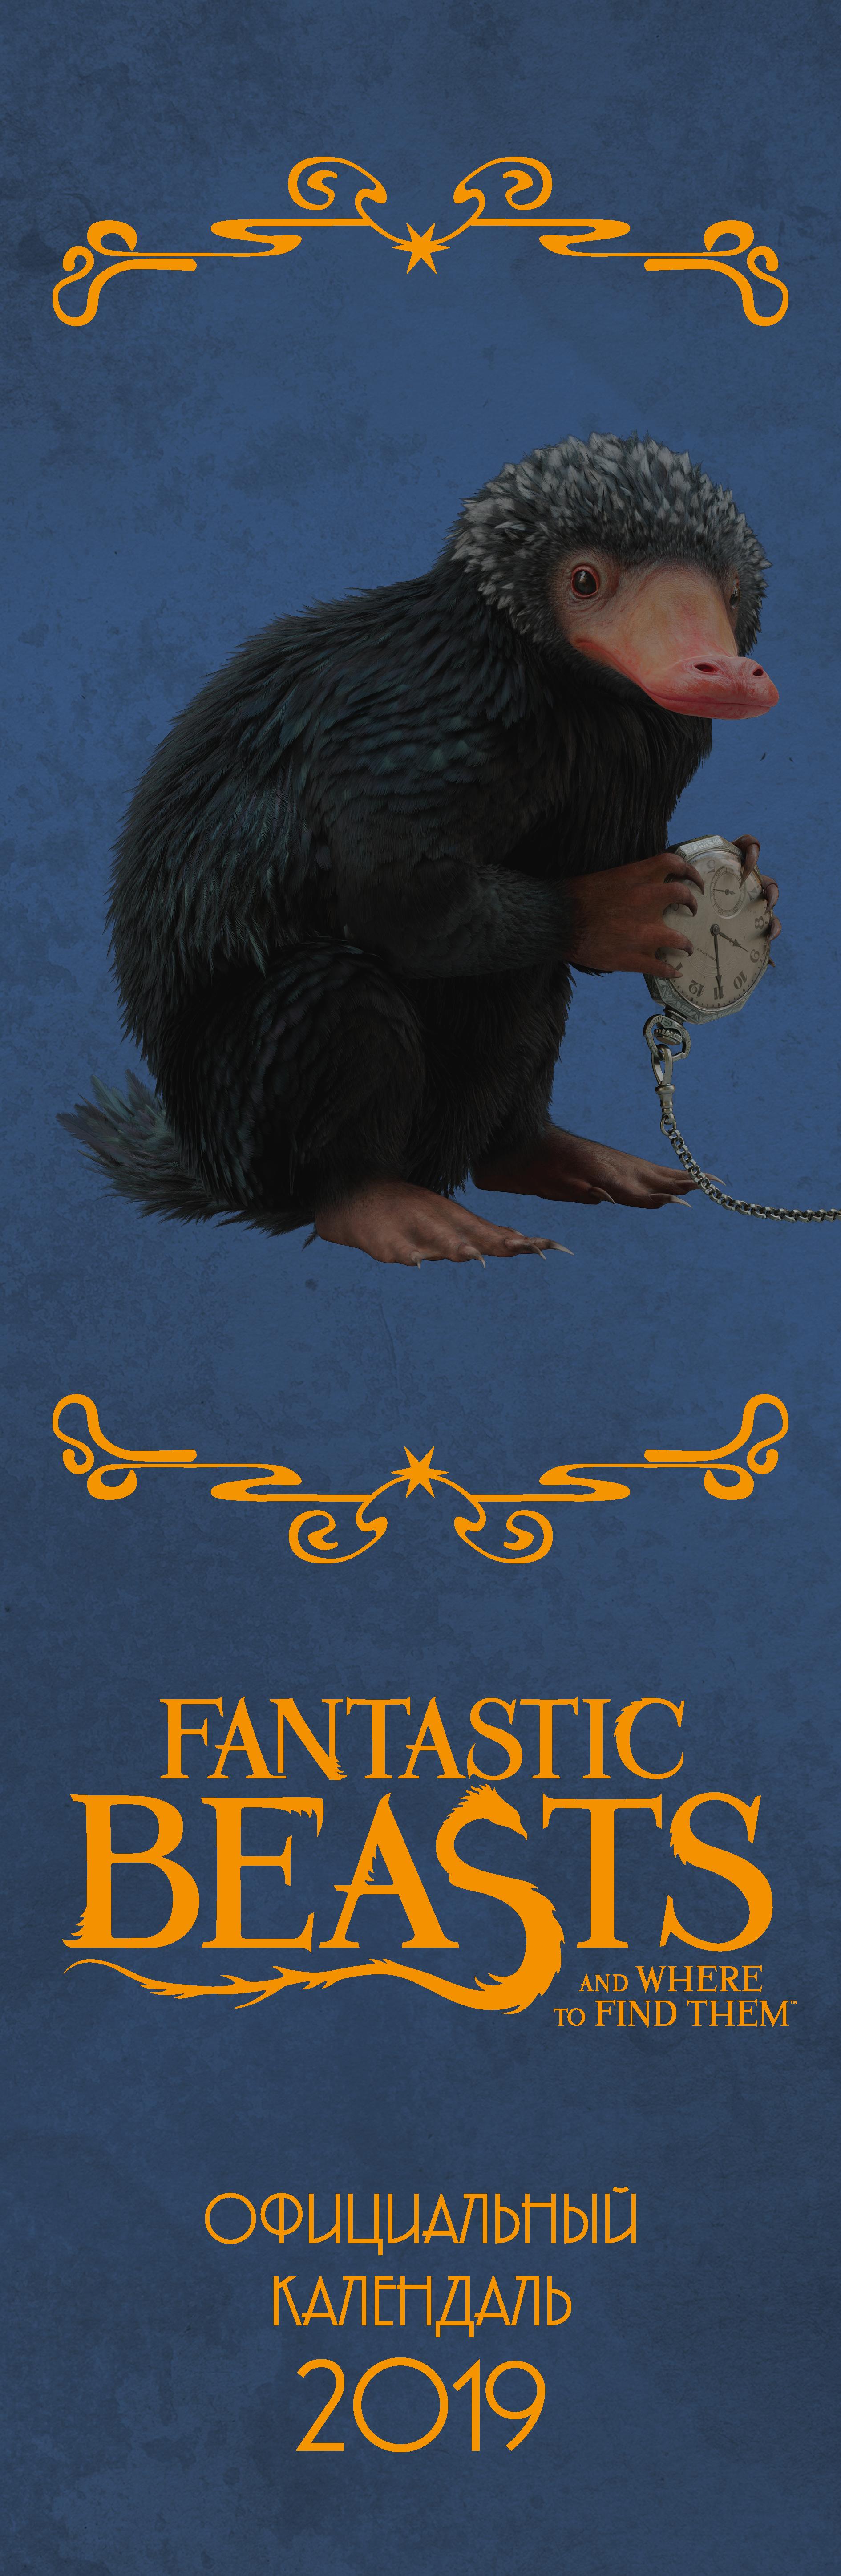 Фантастические твари. Календарь настенный на 2019 год (160х490 мм) ISBN: 978-5-04-095266-3